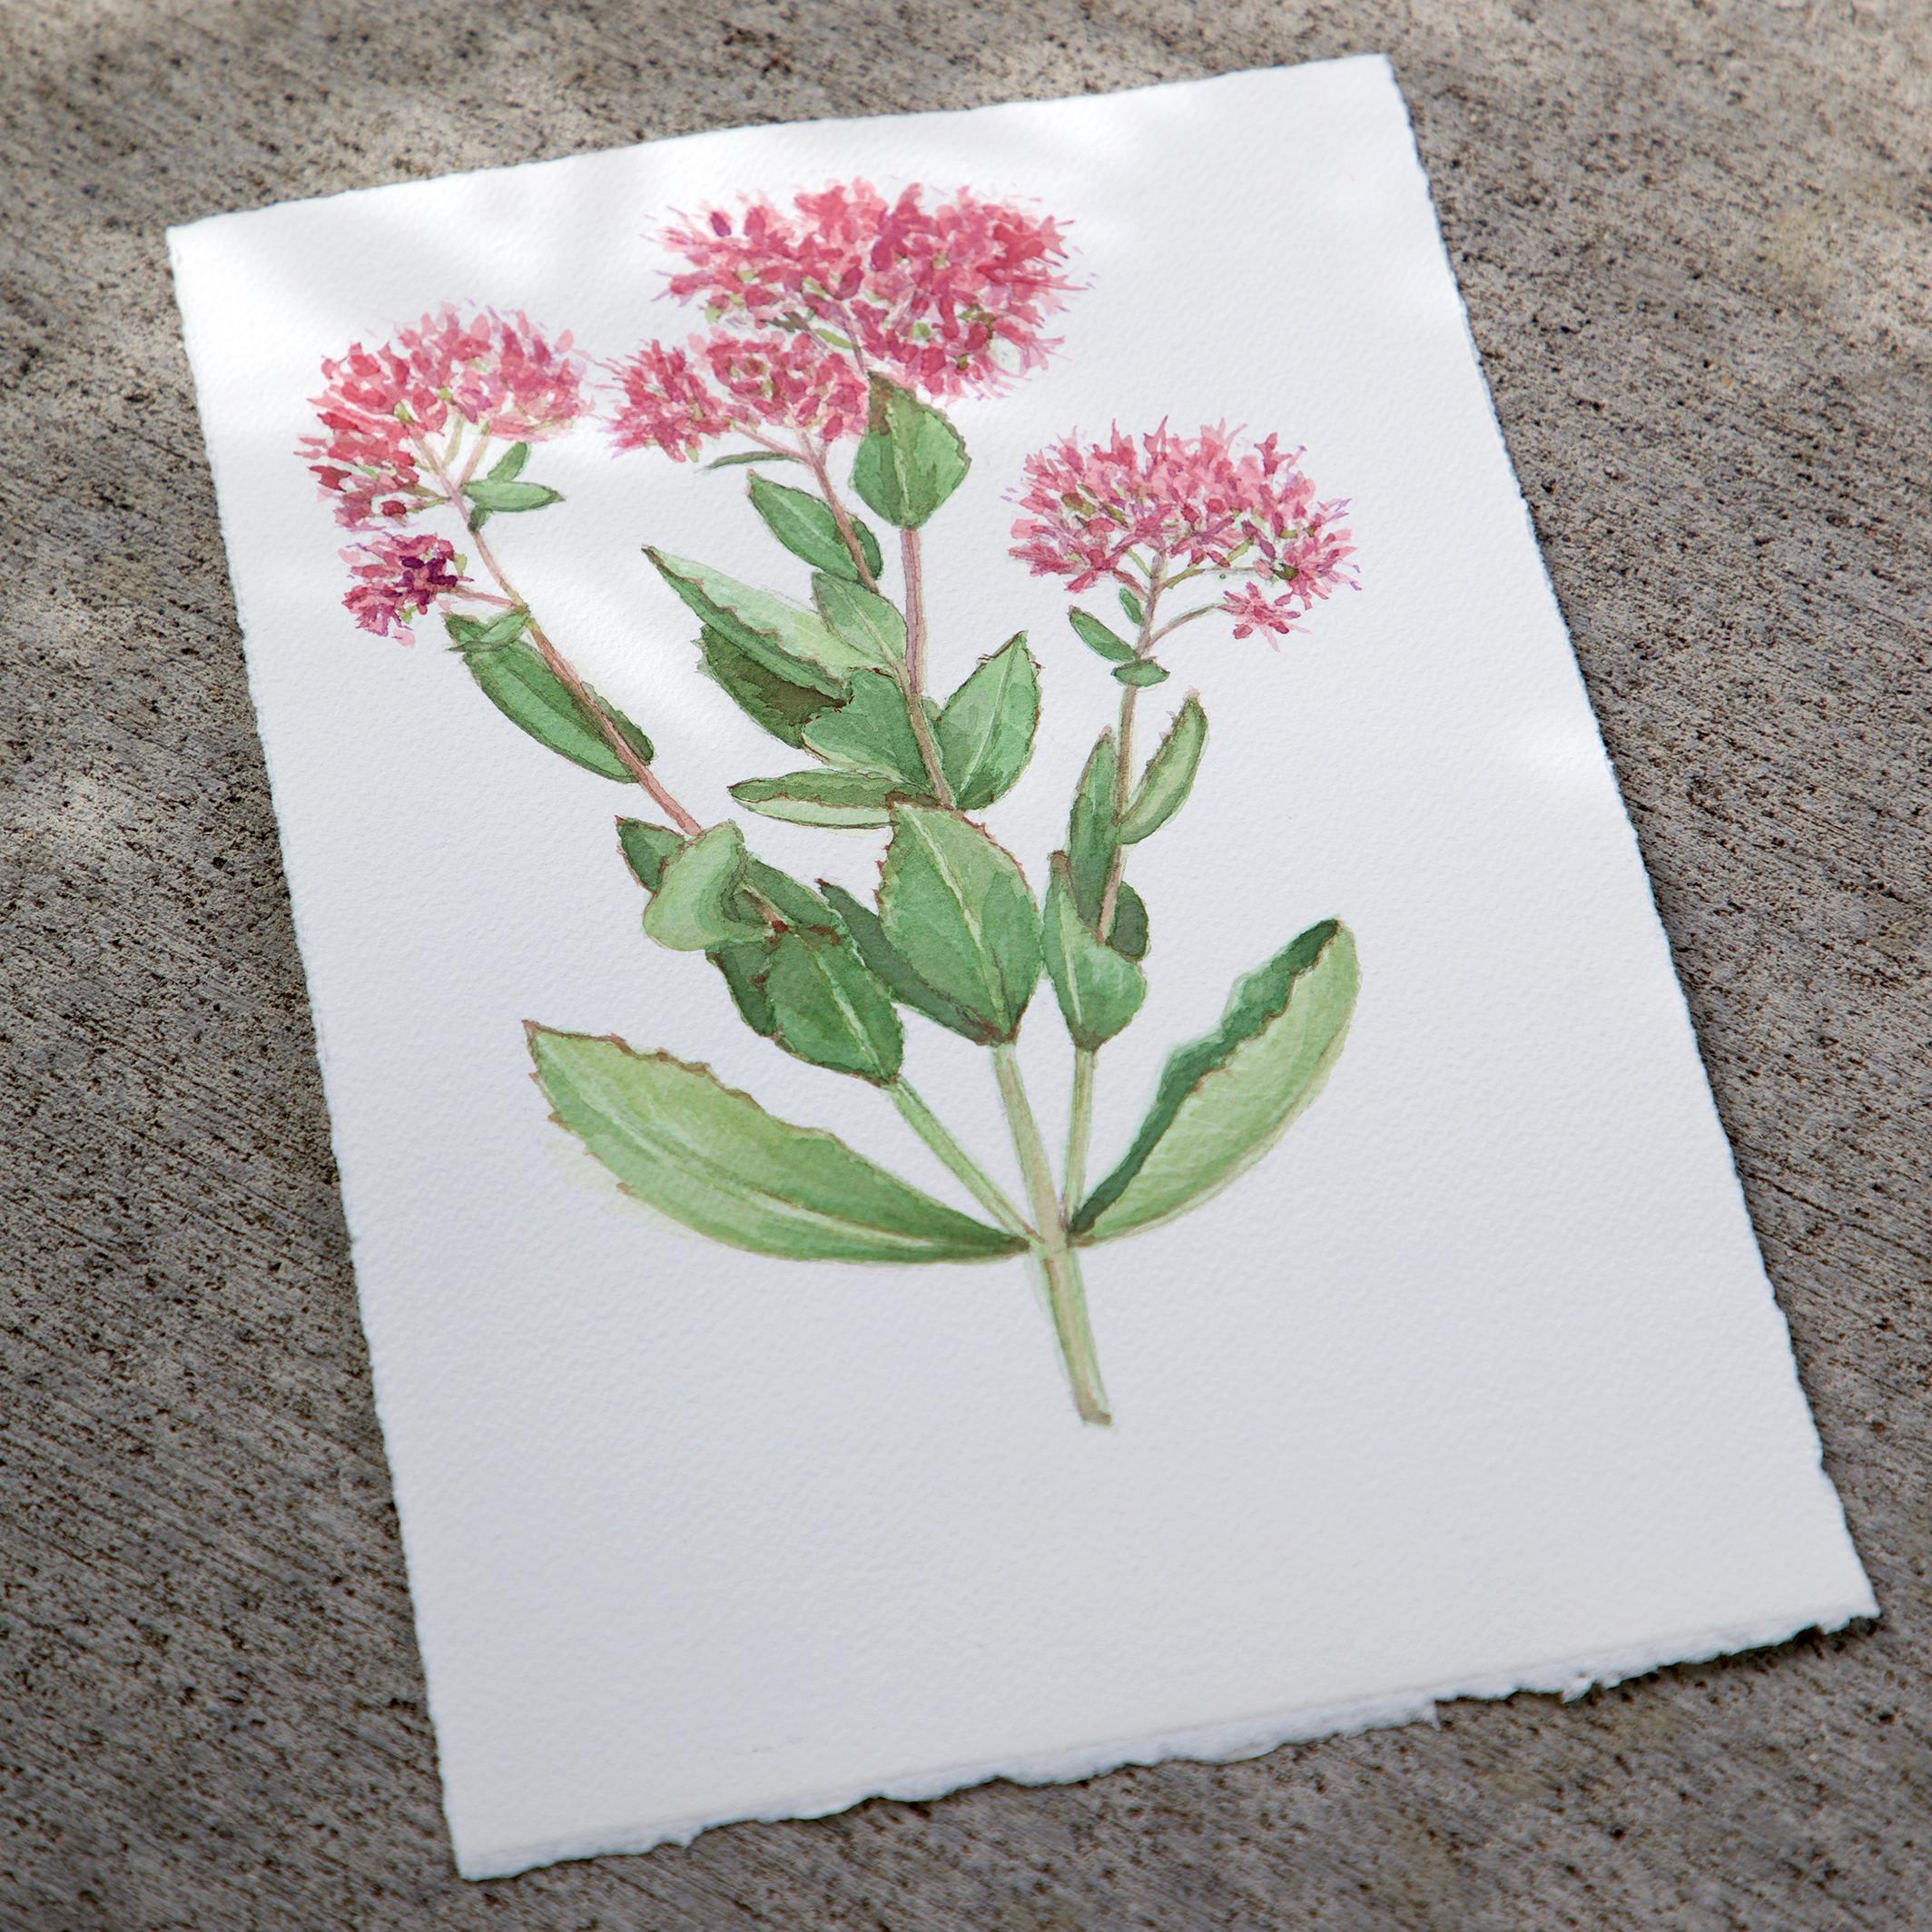 Autumn Joy watercolor by Sharon Holland